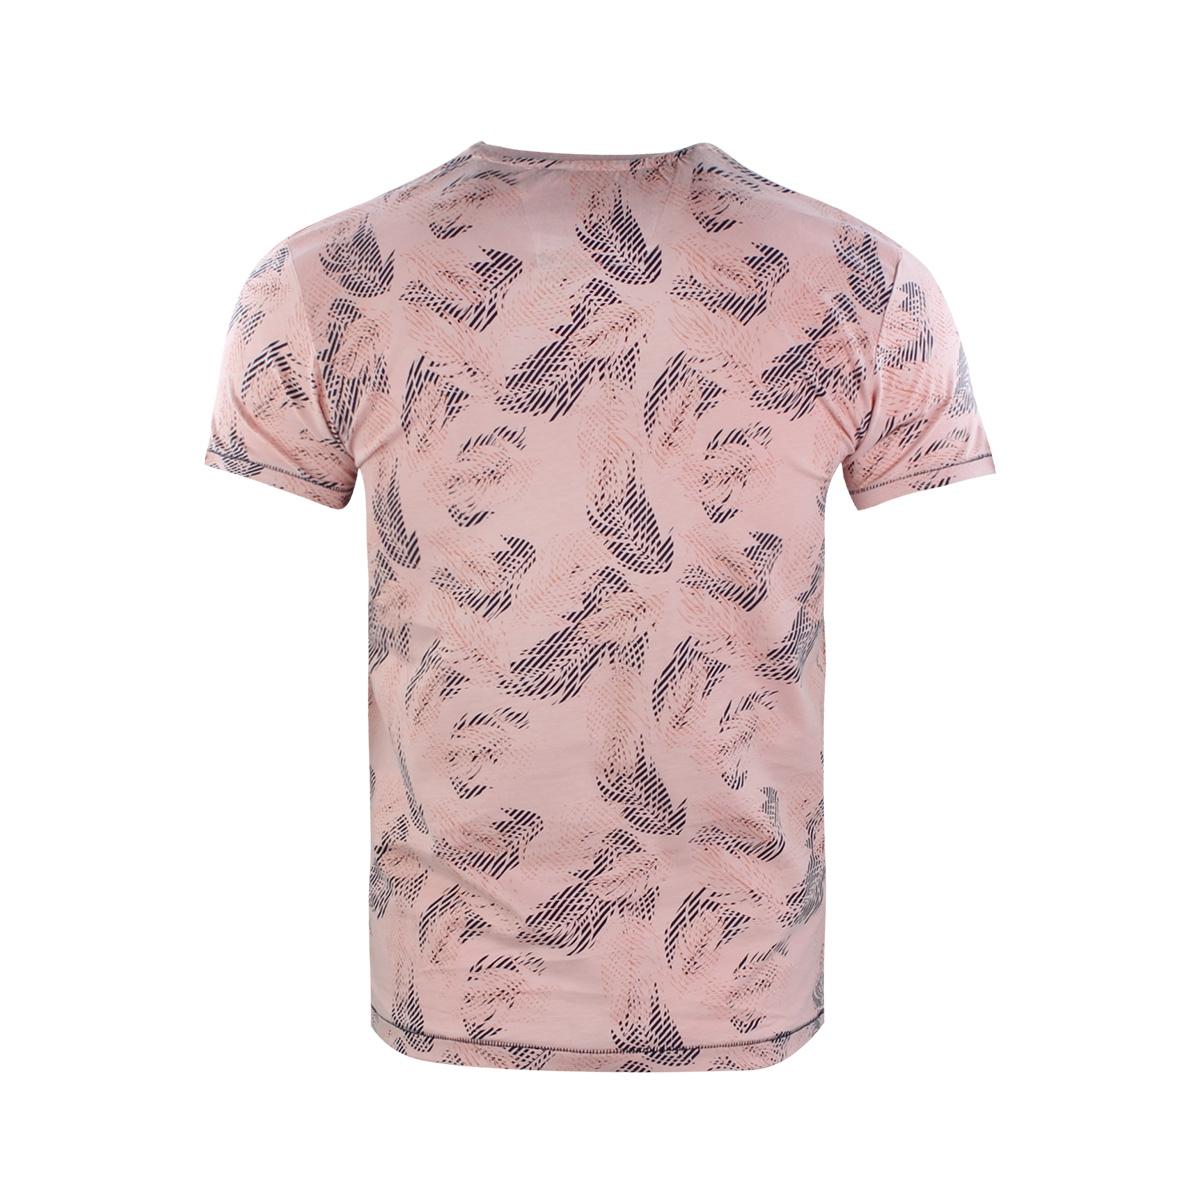 t shirt 15175 gabbiano t-shirt pink